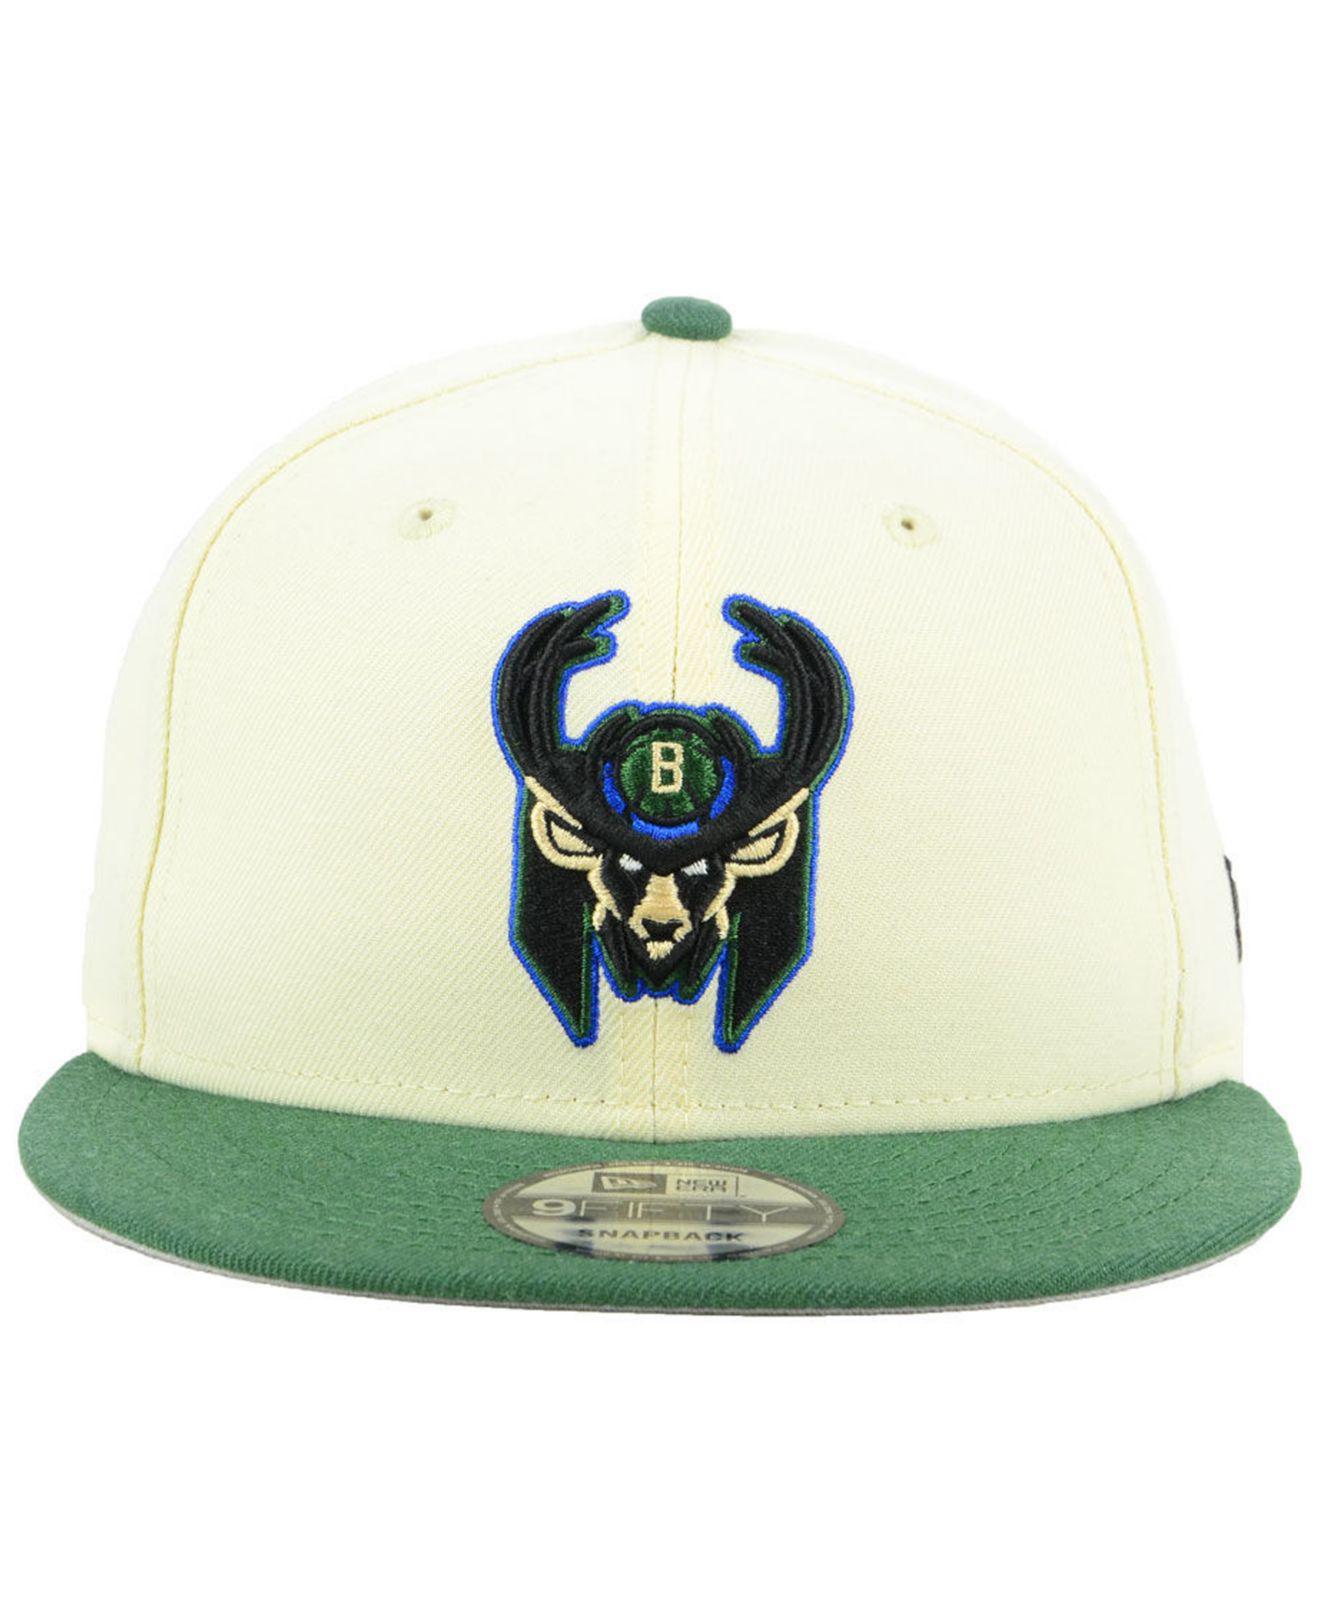 Lyst - KTZ Milwaukee Bucks Light City Combo 9fifty Snapback Cap in Green  for Men 2c953420ca4f